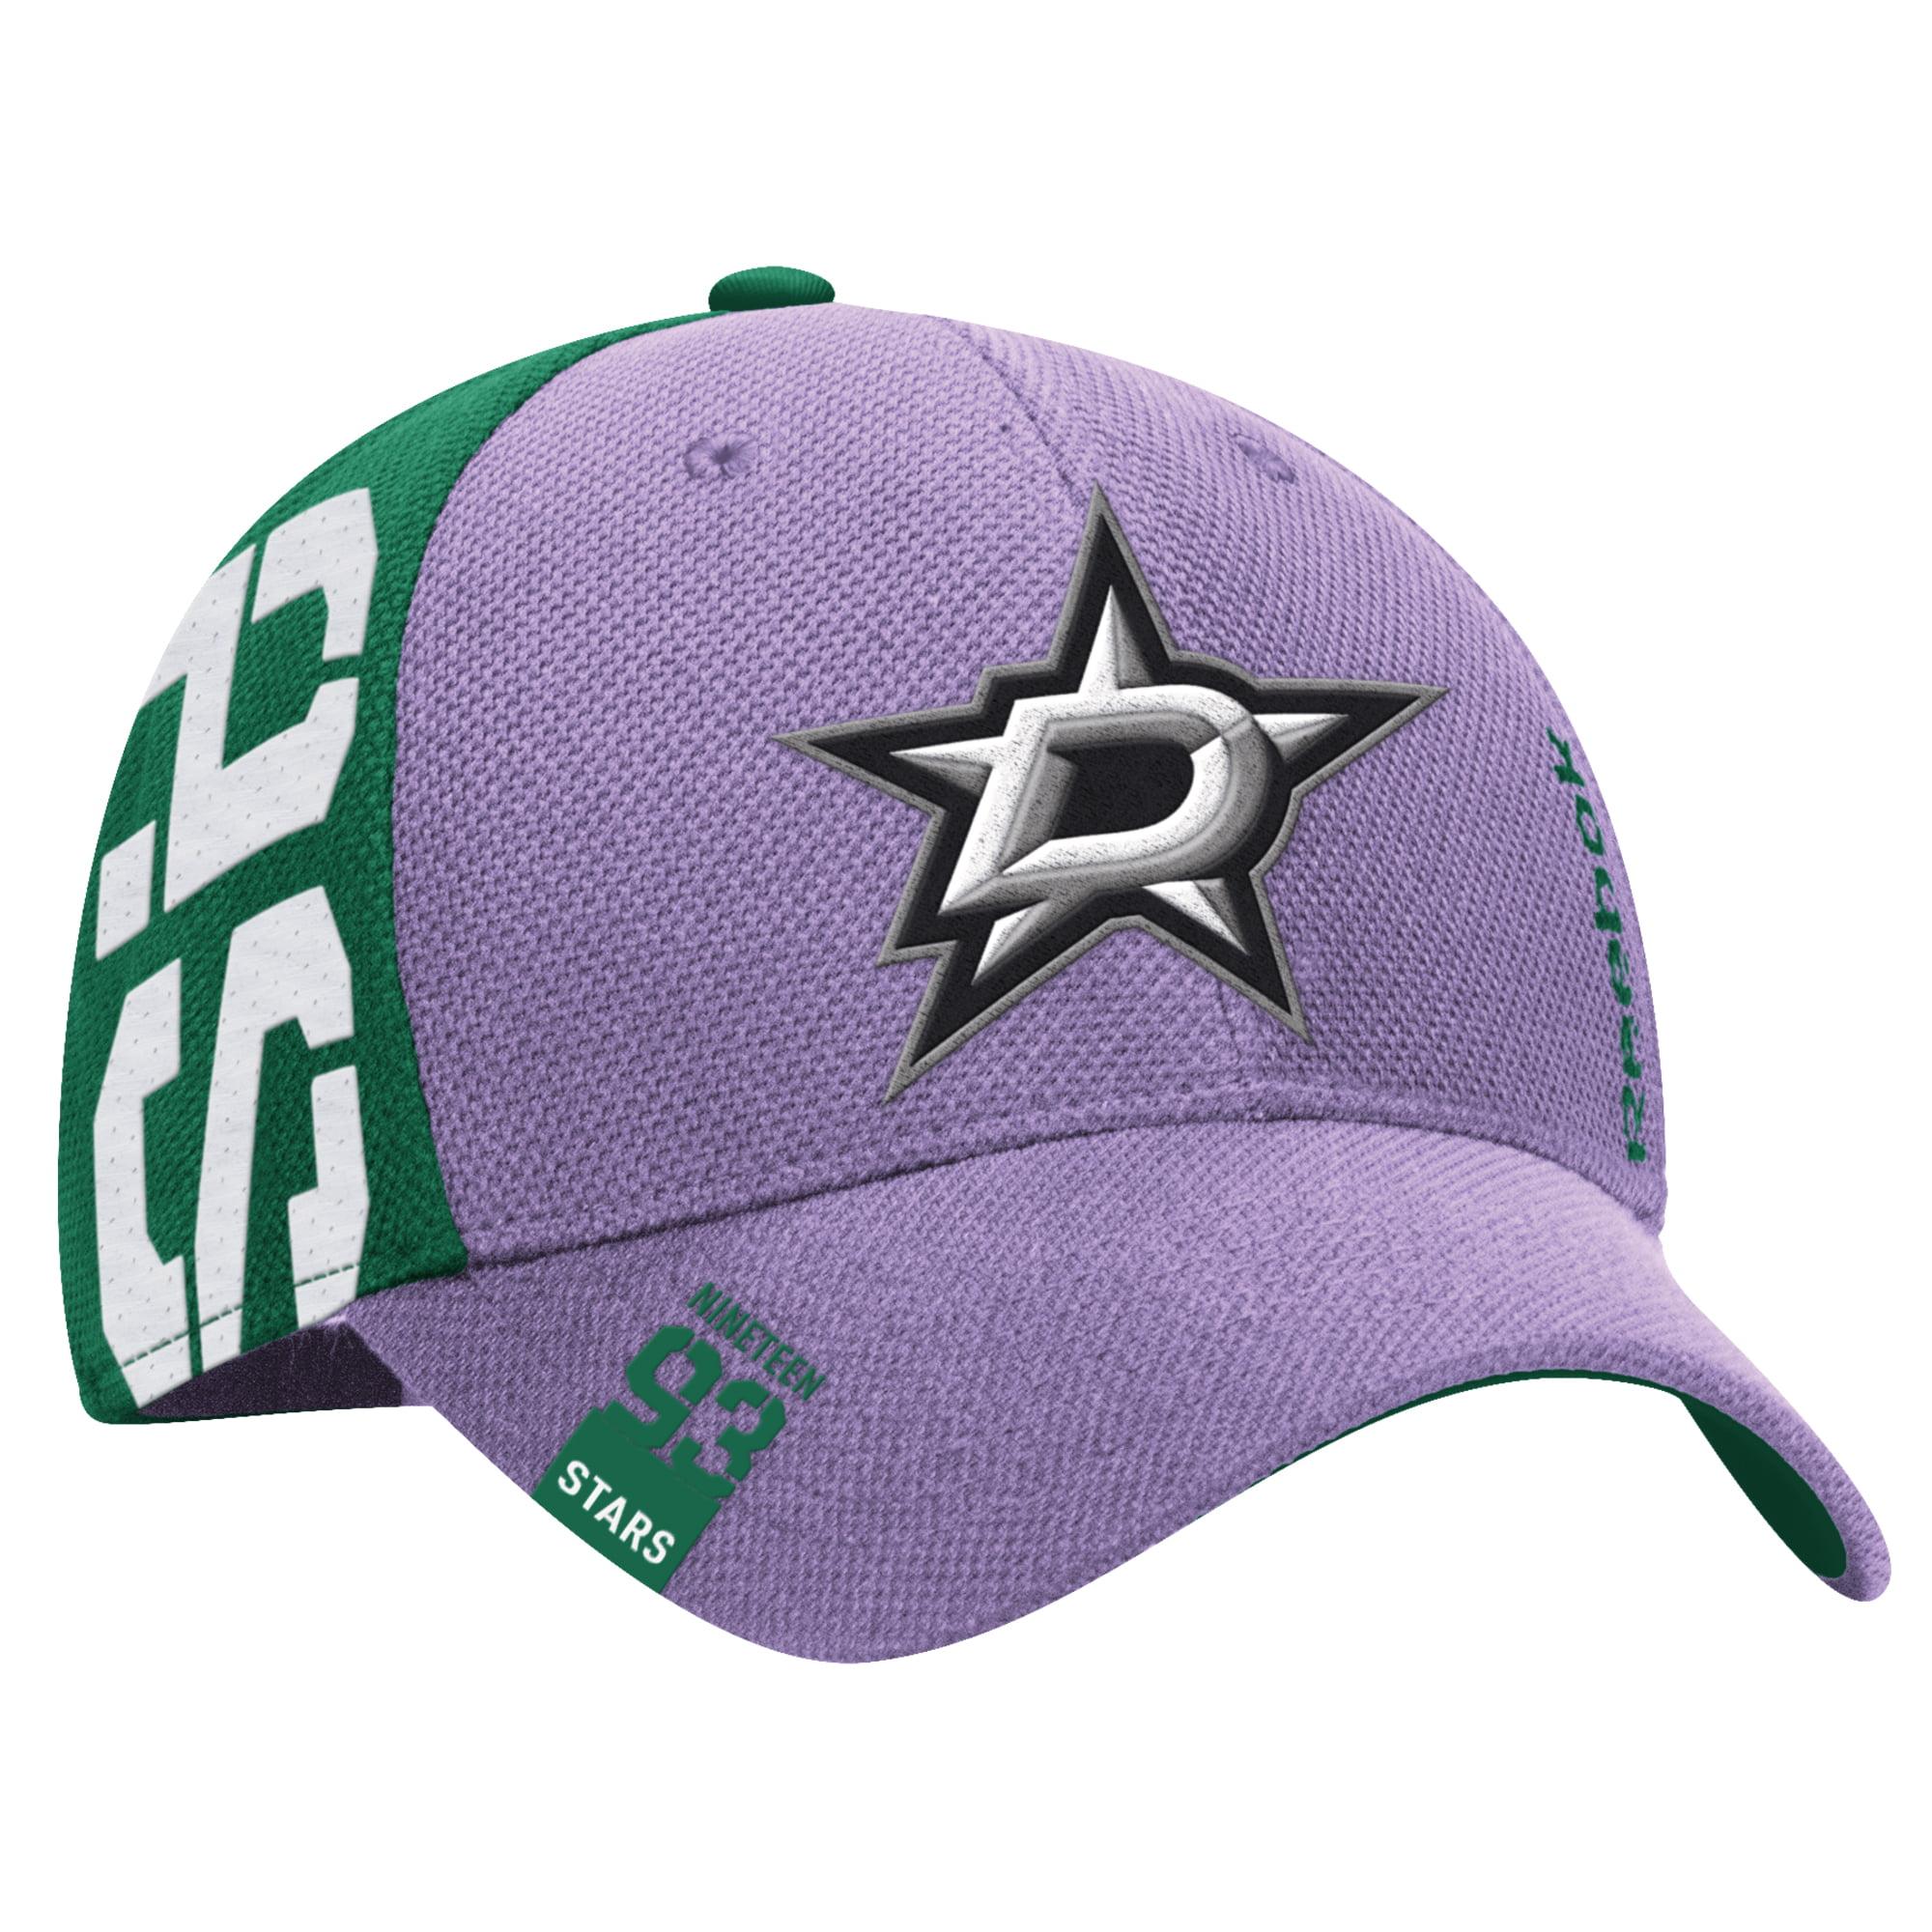 finest selection c1244 0e7f5 Dallas Stars Reebok Hockey Fights Cancer Flex Hat - Purple ...